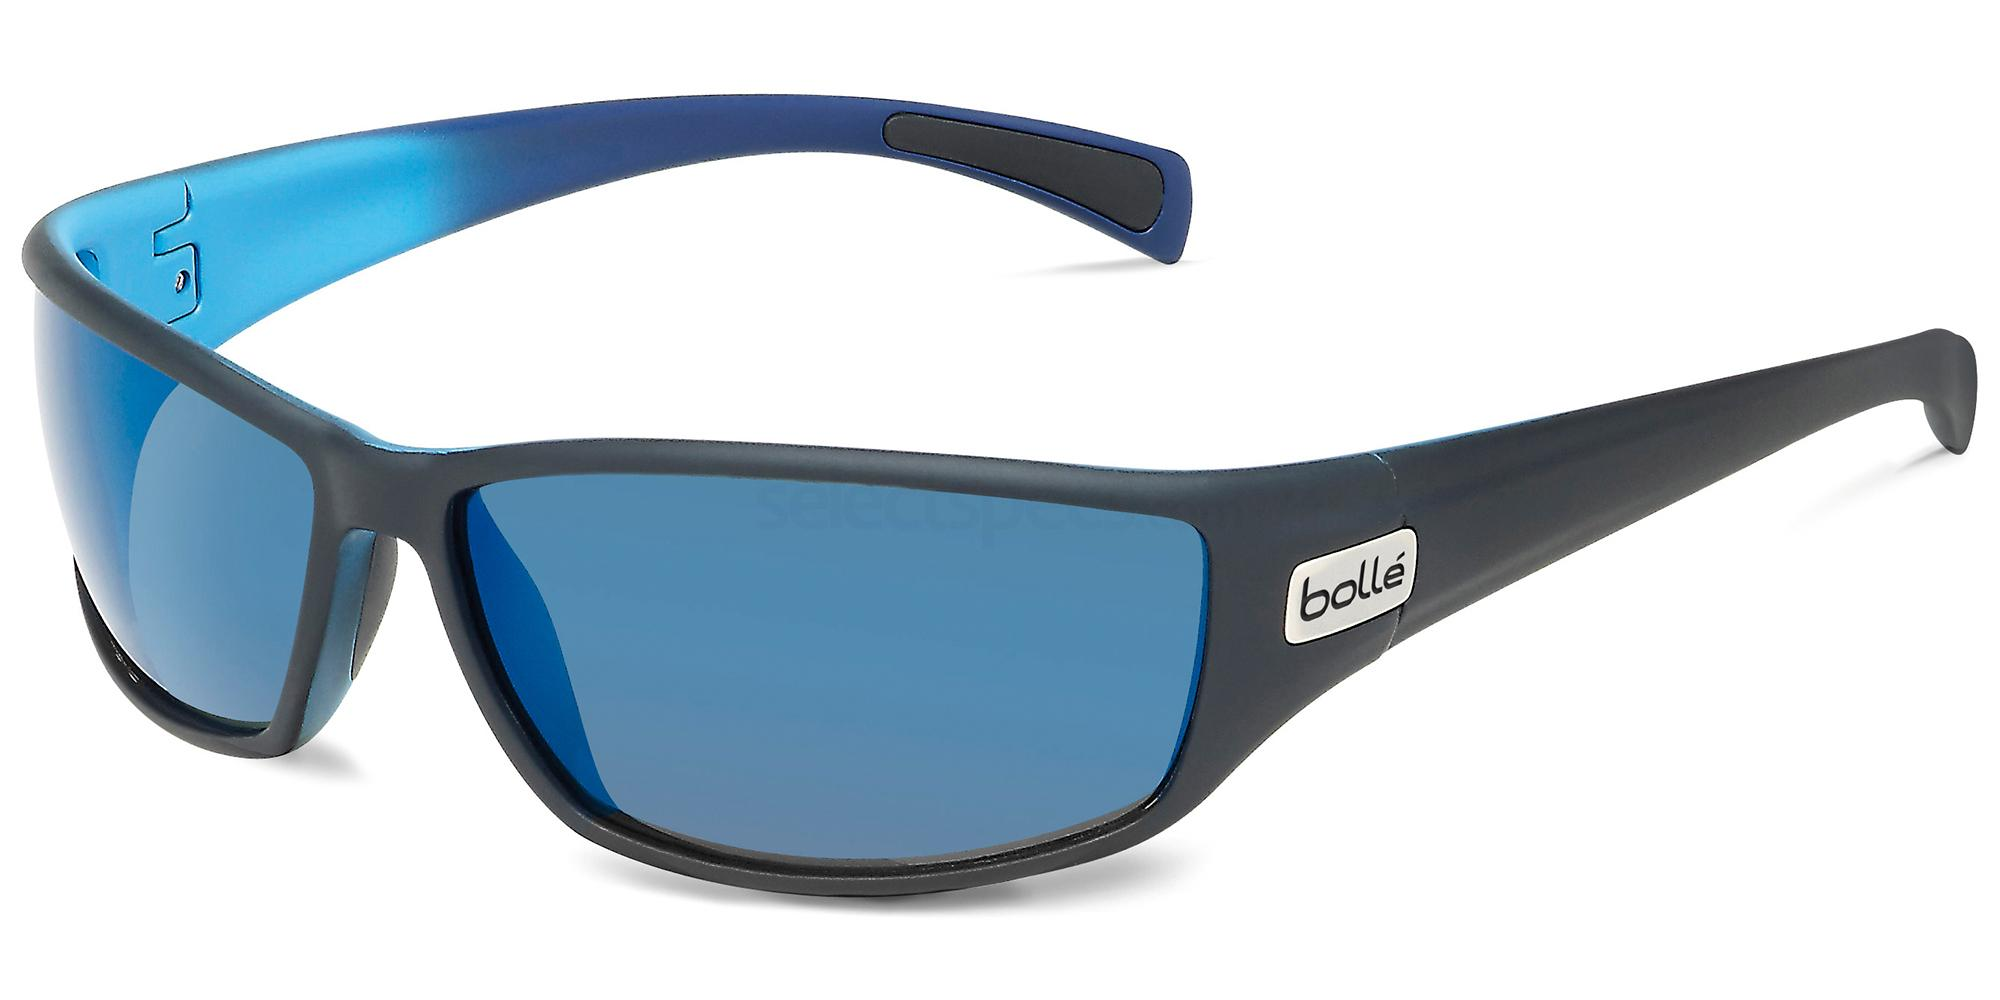 11693 Python Sunglasses, Bolle